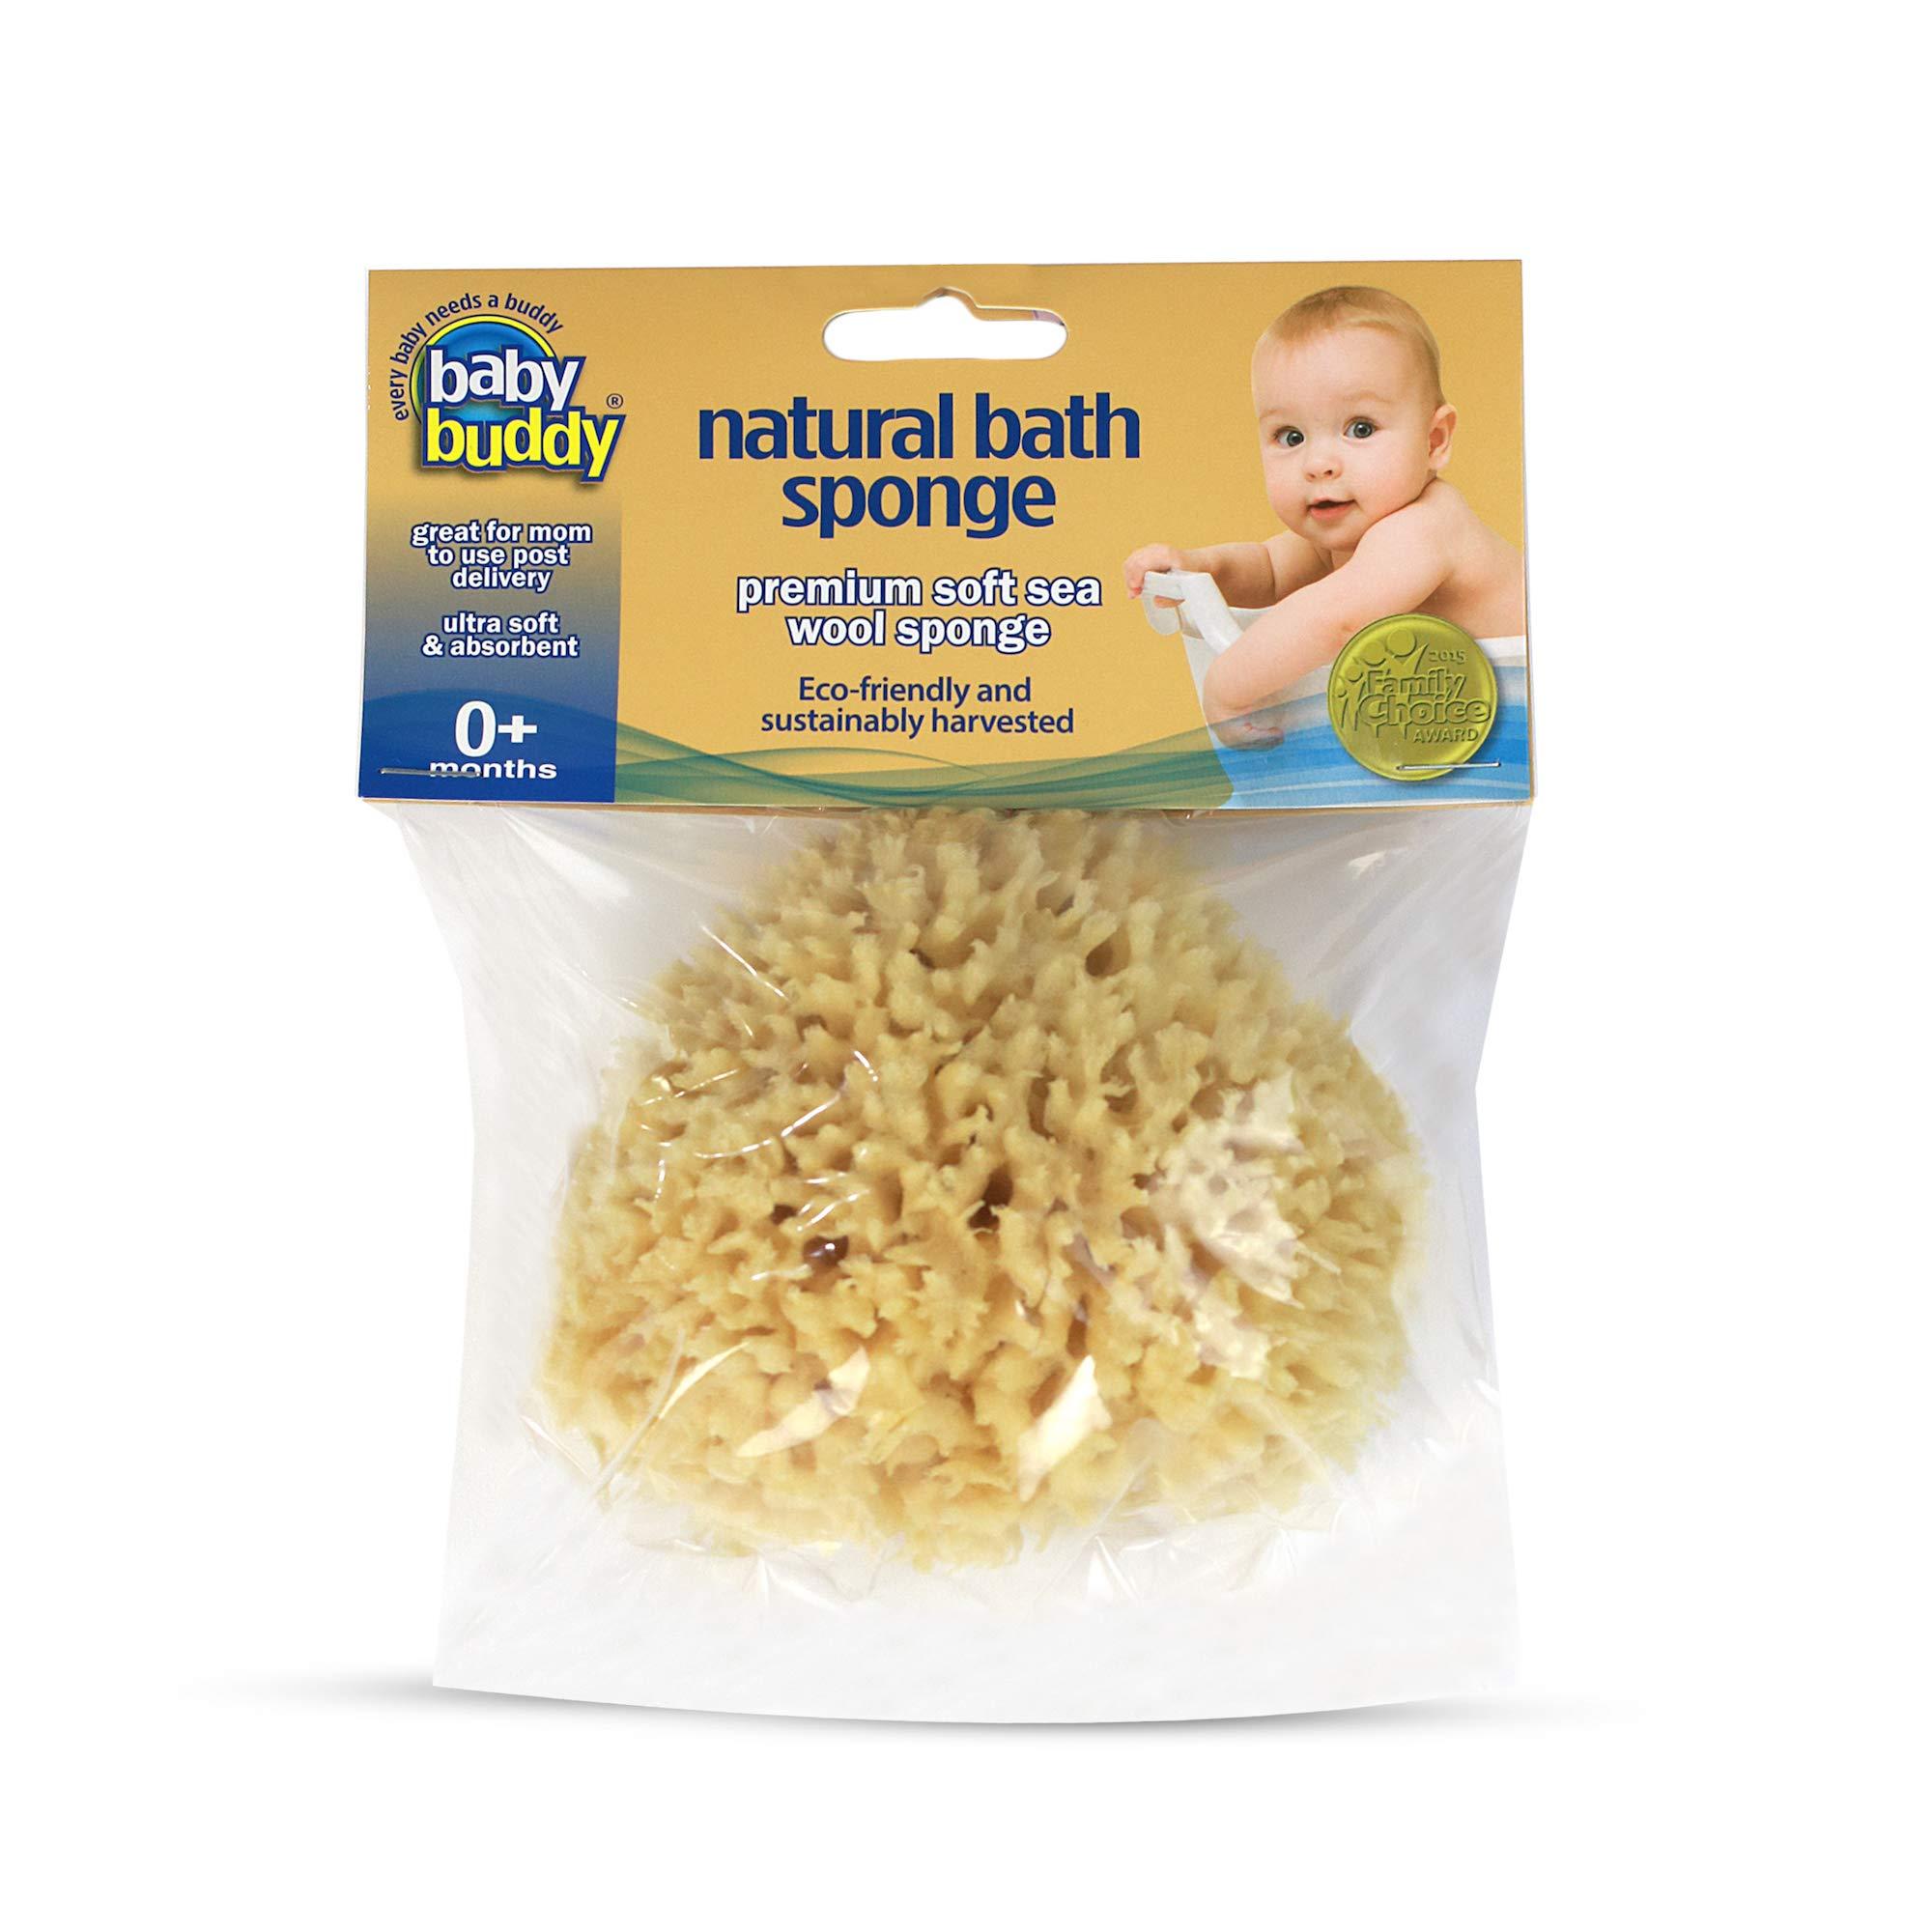 "Baby Buddy's Natural Baby Bath Sponge 4-5"" Ultra Soft Premium Sea Wool Sponge Soft on Baby's Tender Skin, Biodegradable, Hypoallergenic, Absorbent Natural Sea Sponge"